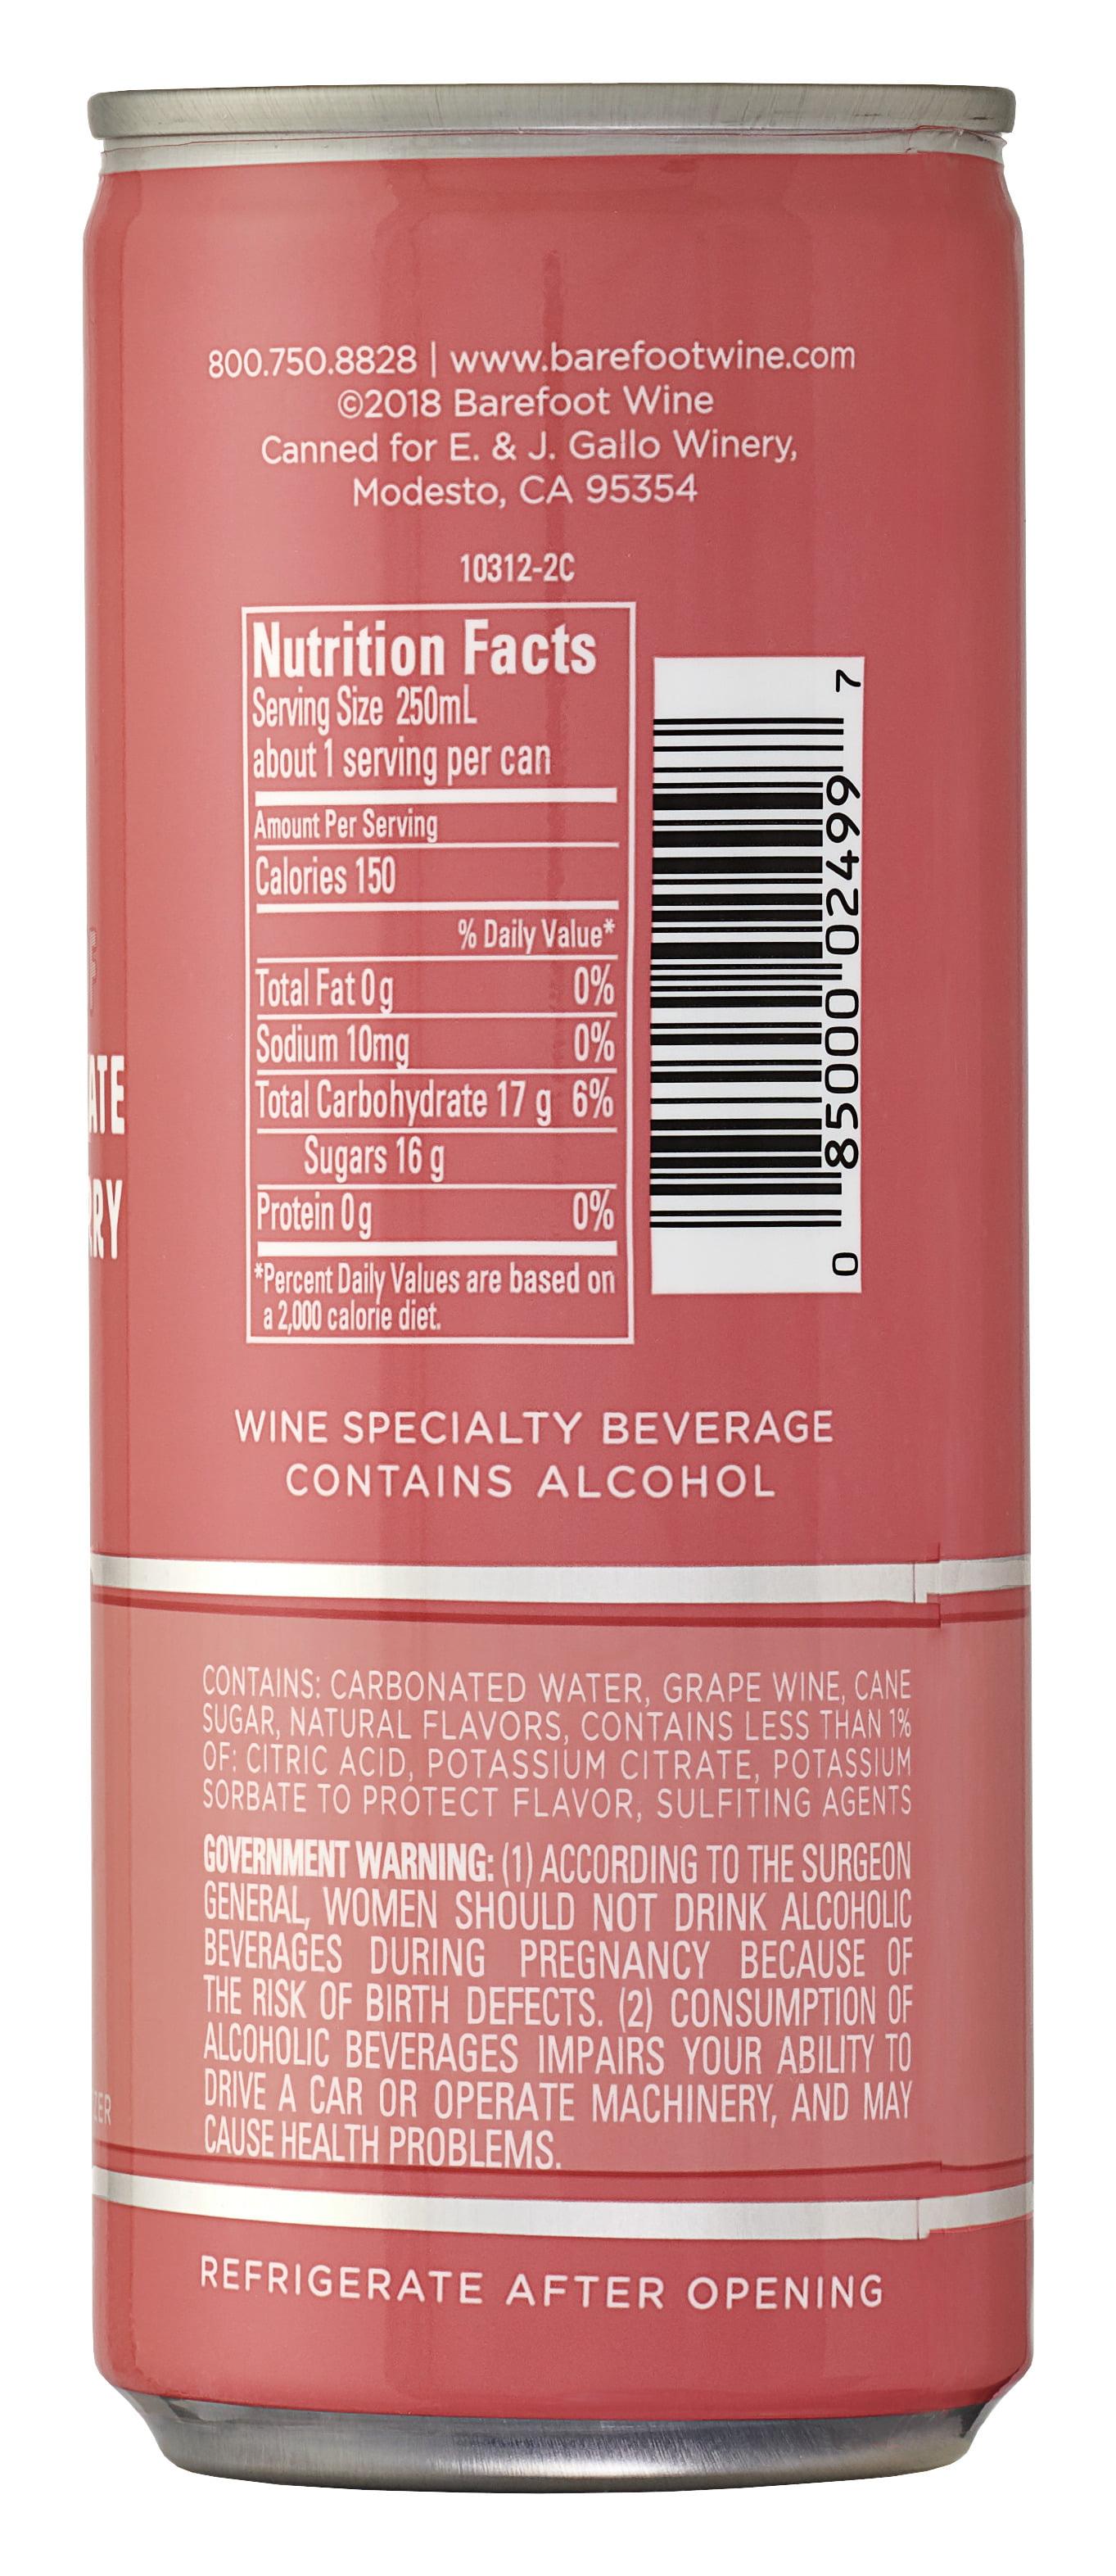 Barefoot Refresh Rose Moscato Spritzer 4 Pack 187 Ml Cans Walmart Com Walmart Com